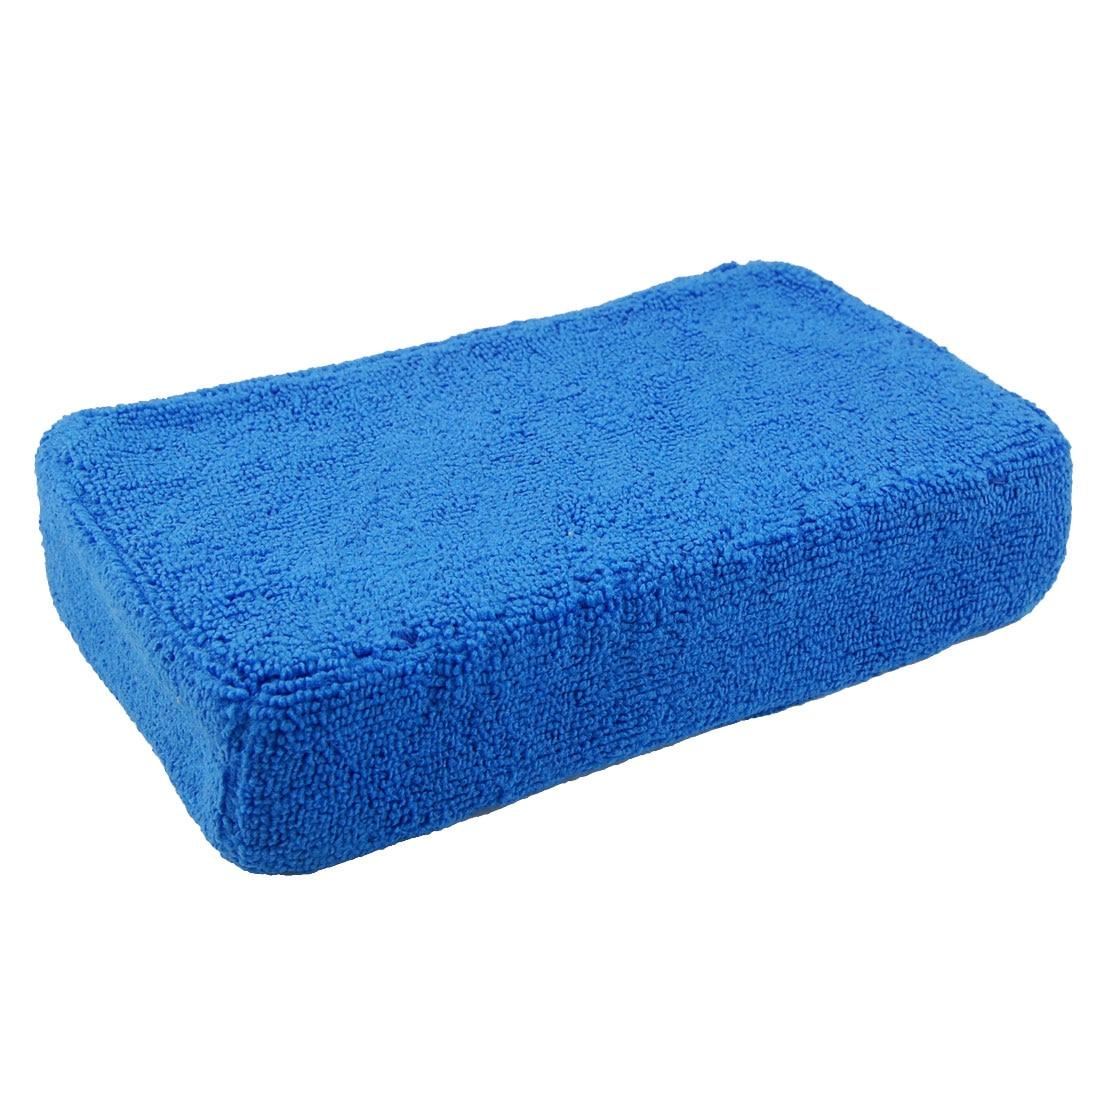 UXCELL Car Window Door Rectangular Sponge Cleaning Pad Cleaner Tool Blue